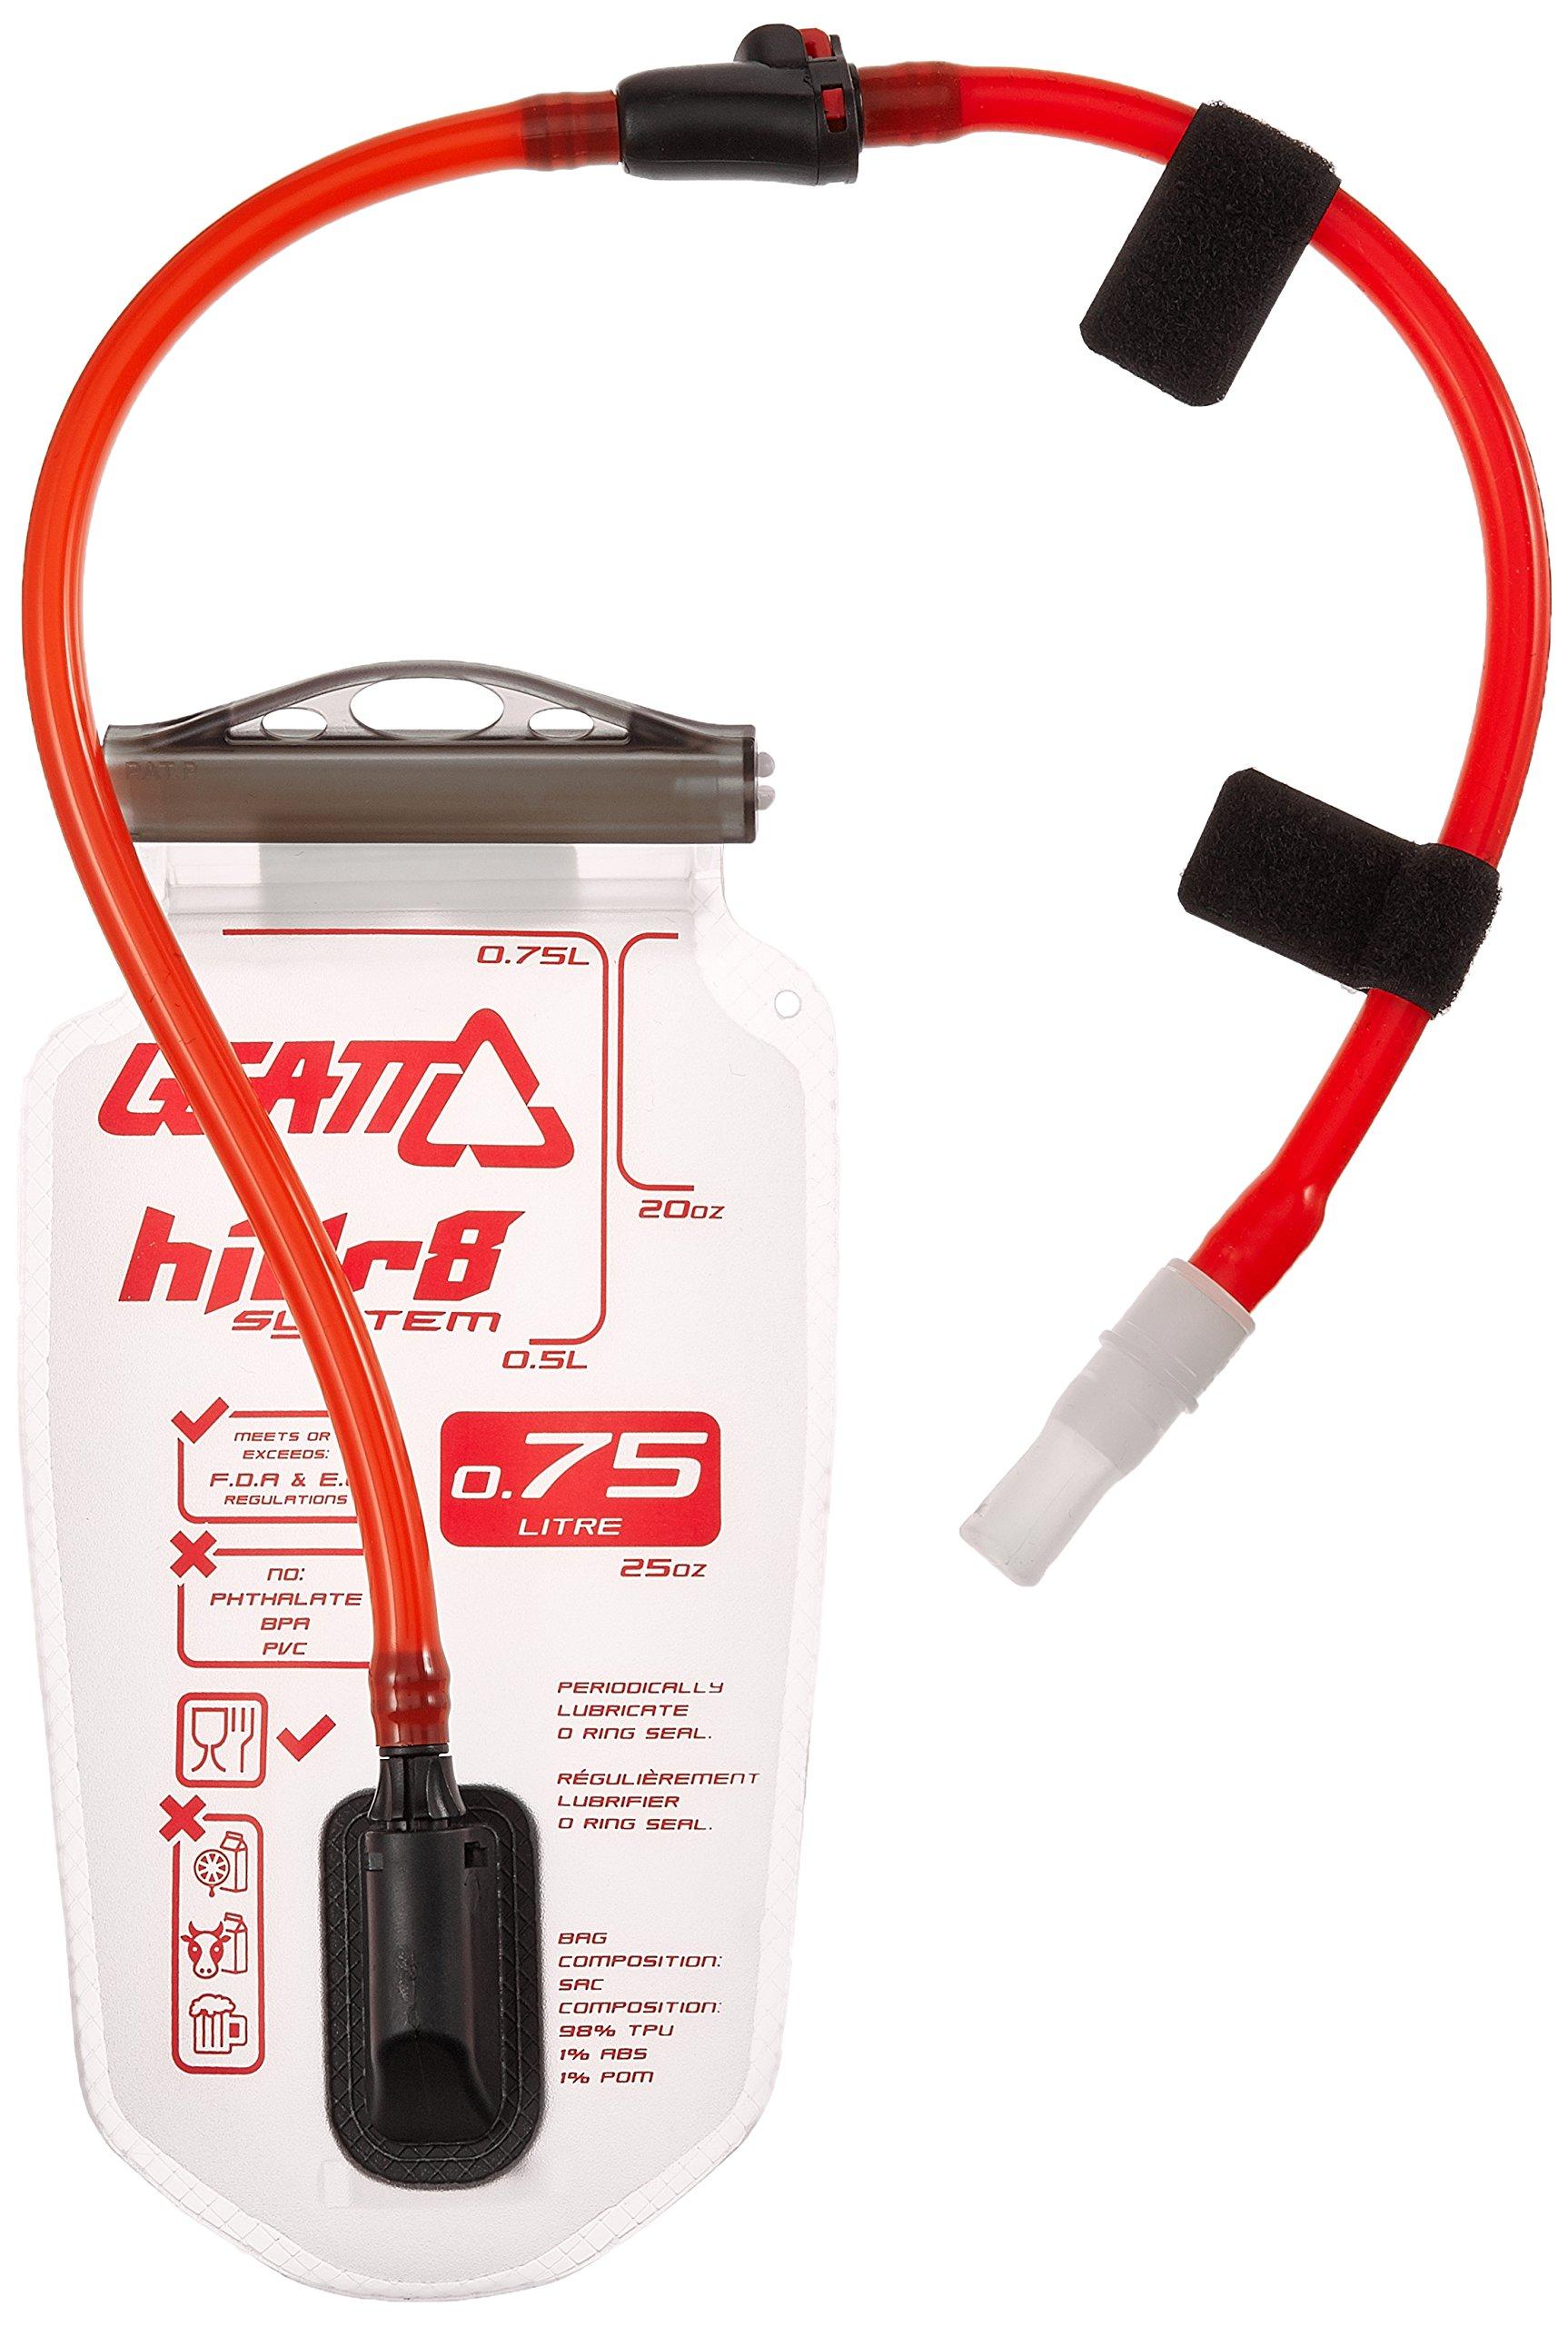 Leatt Hydration Bladder Flat CleanTech Luggage Accessories - 2.0L/70oz by Leatt